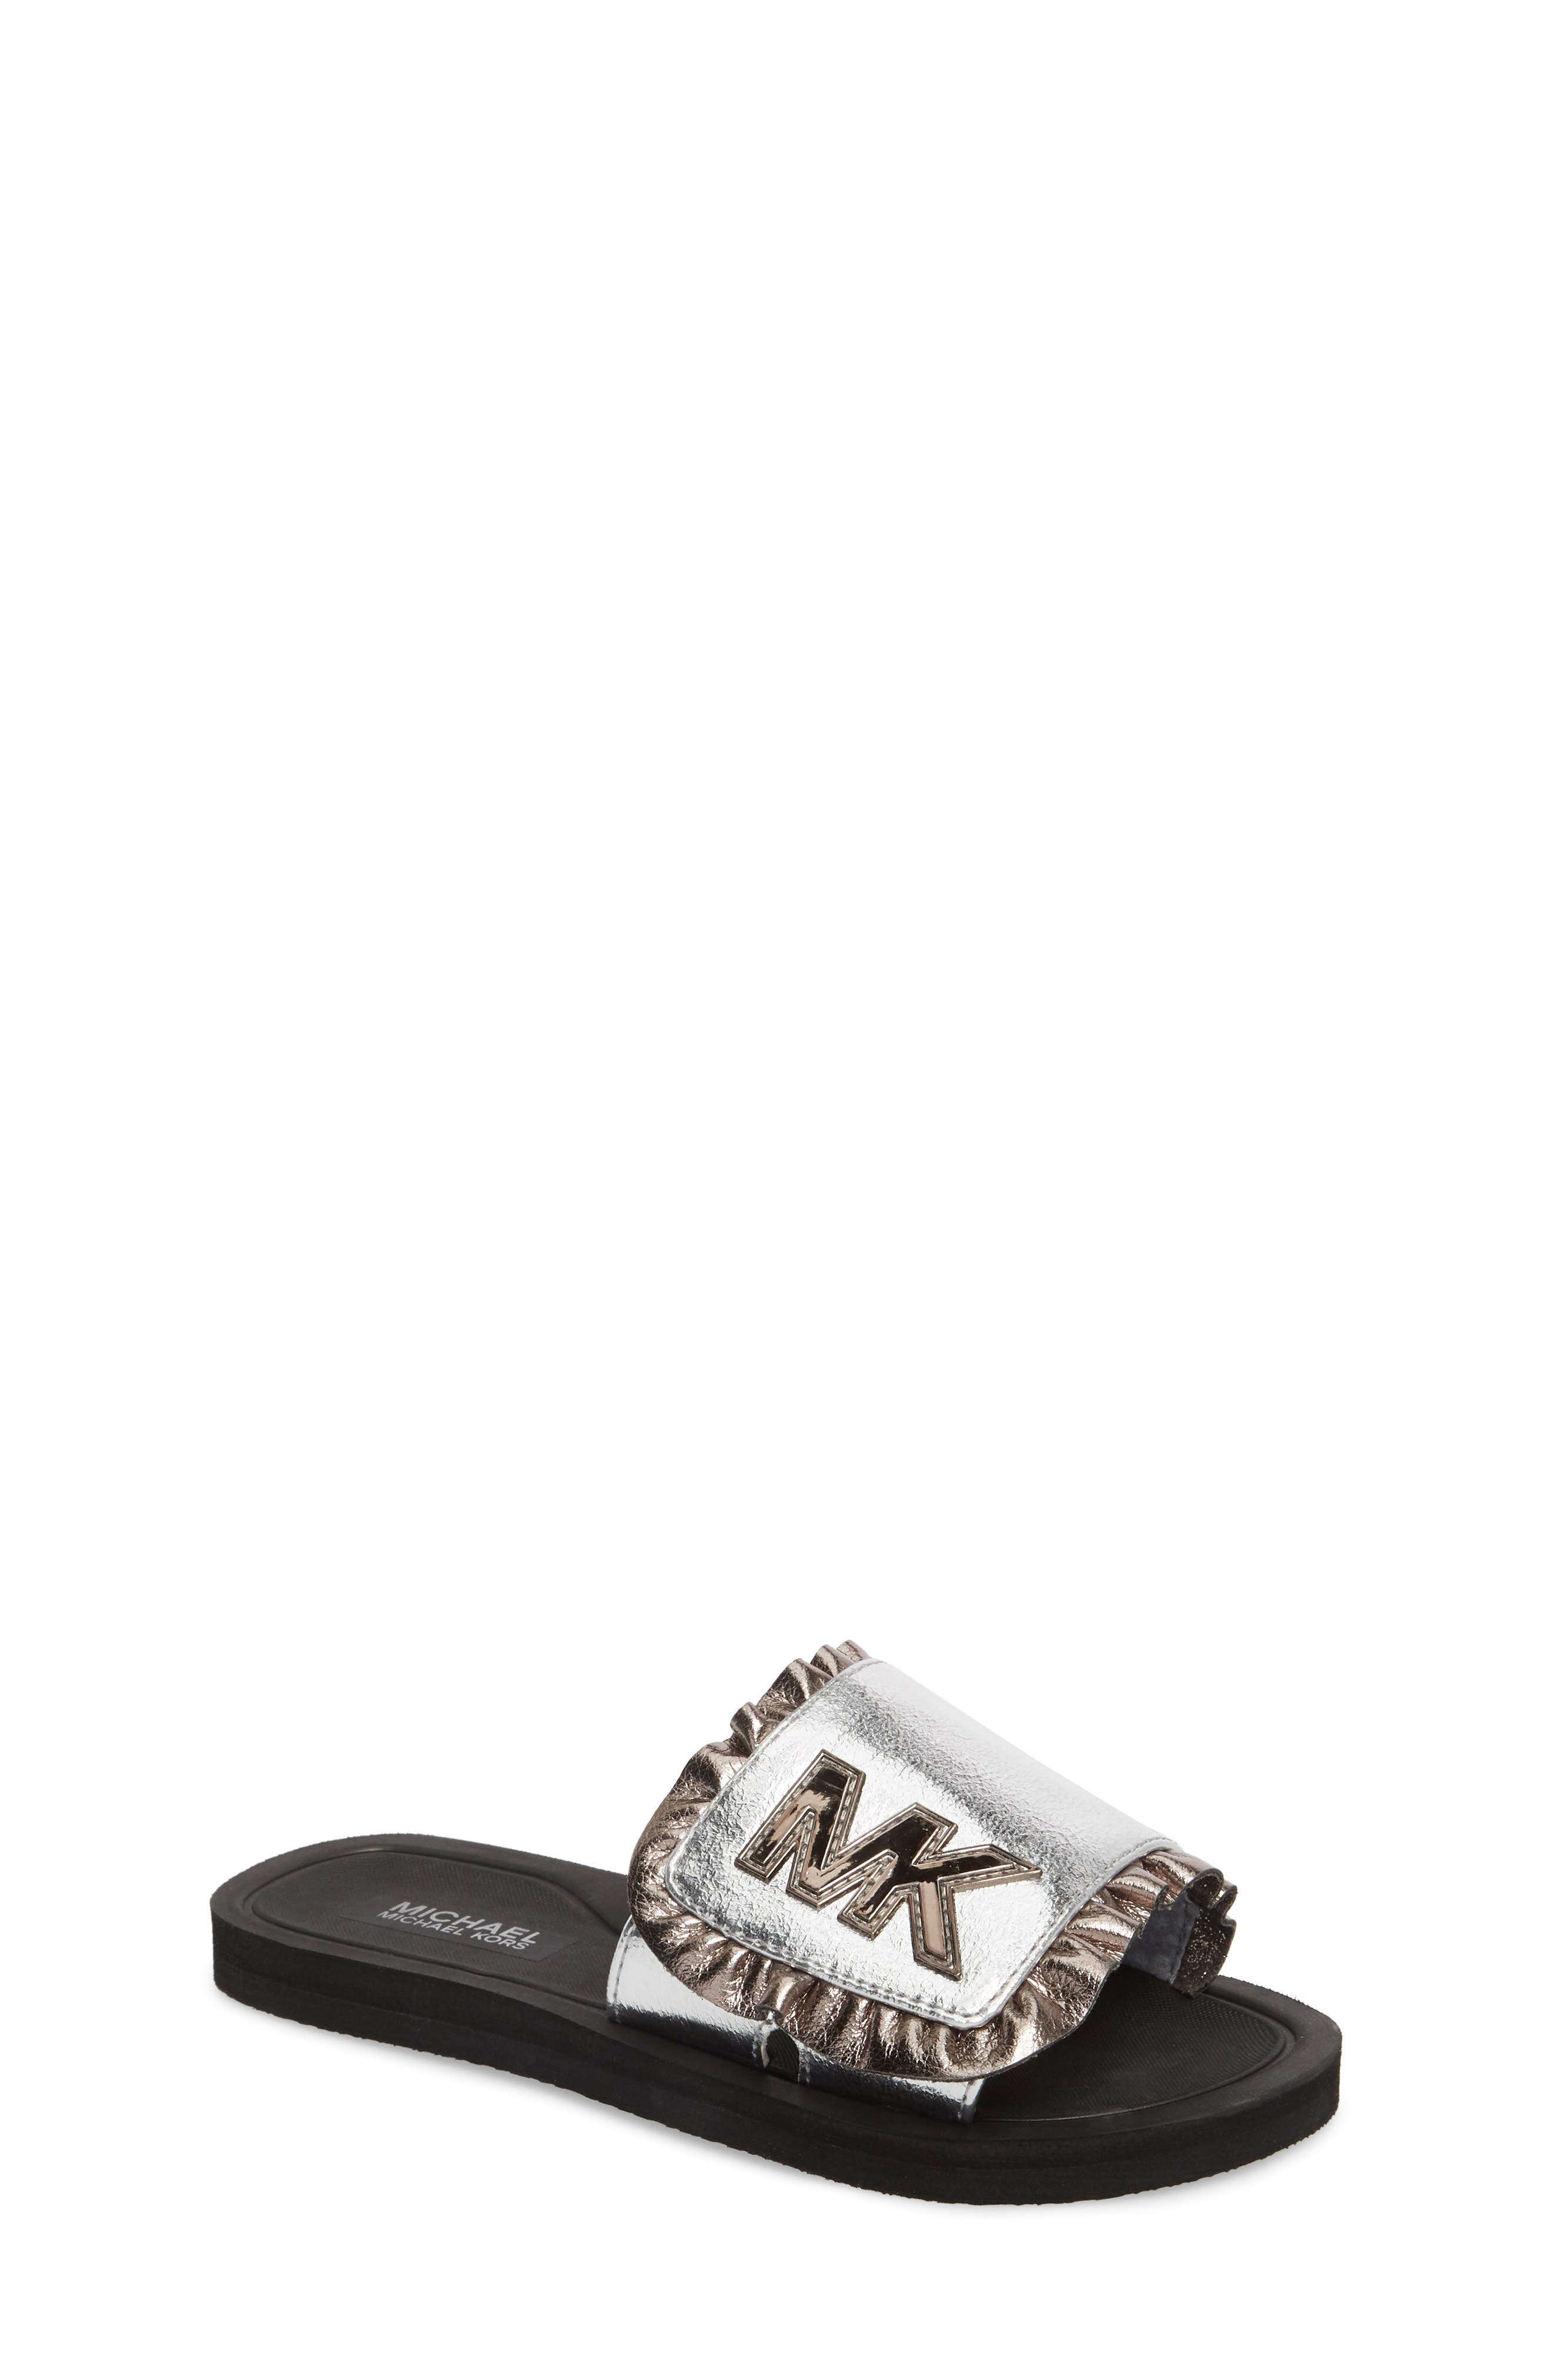 Eli Jack Metallic Slide Sandal,                         Main,                         color, SILVER